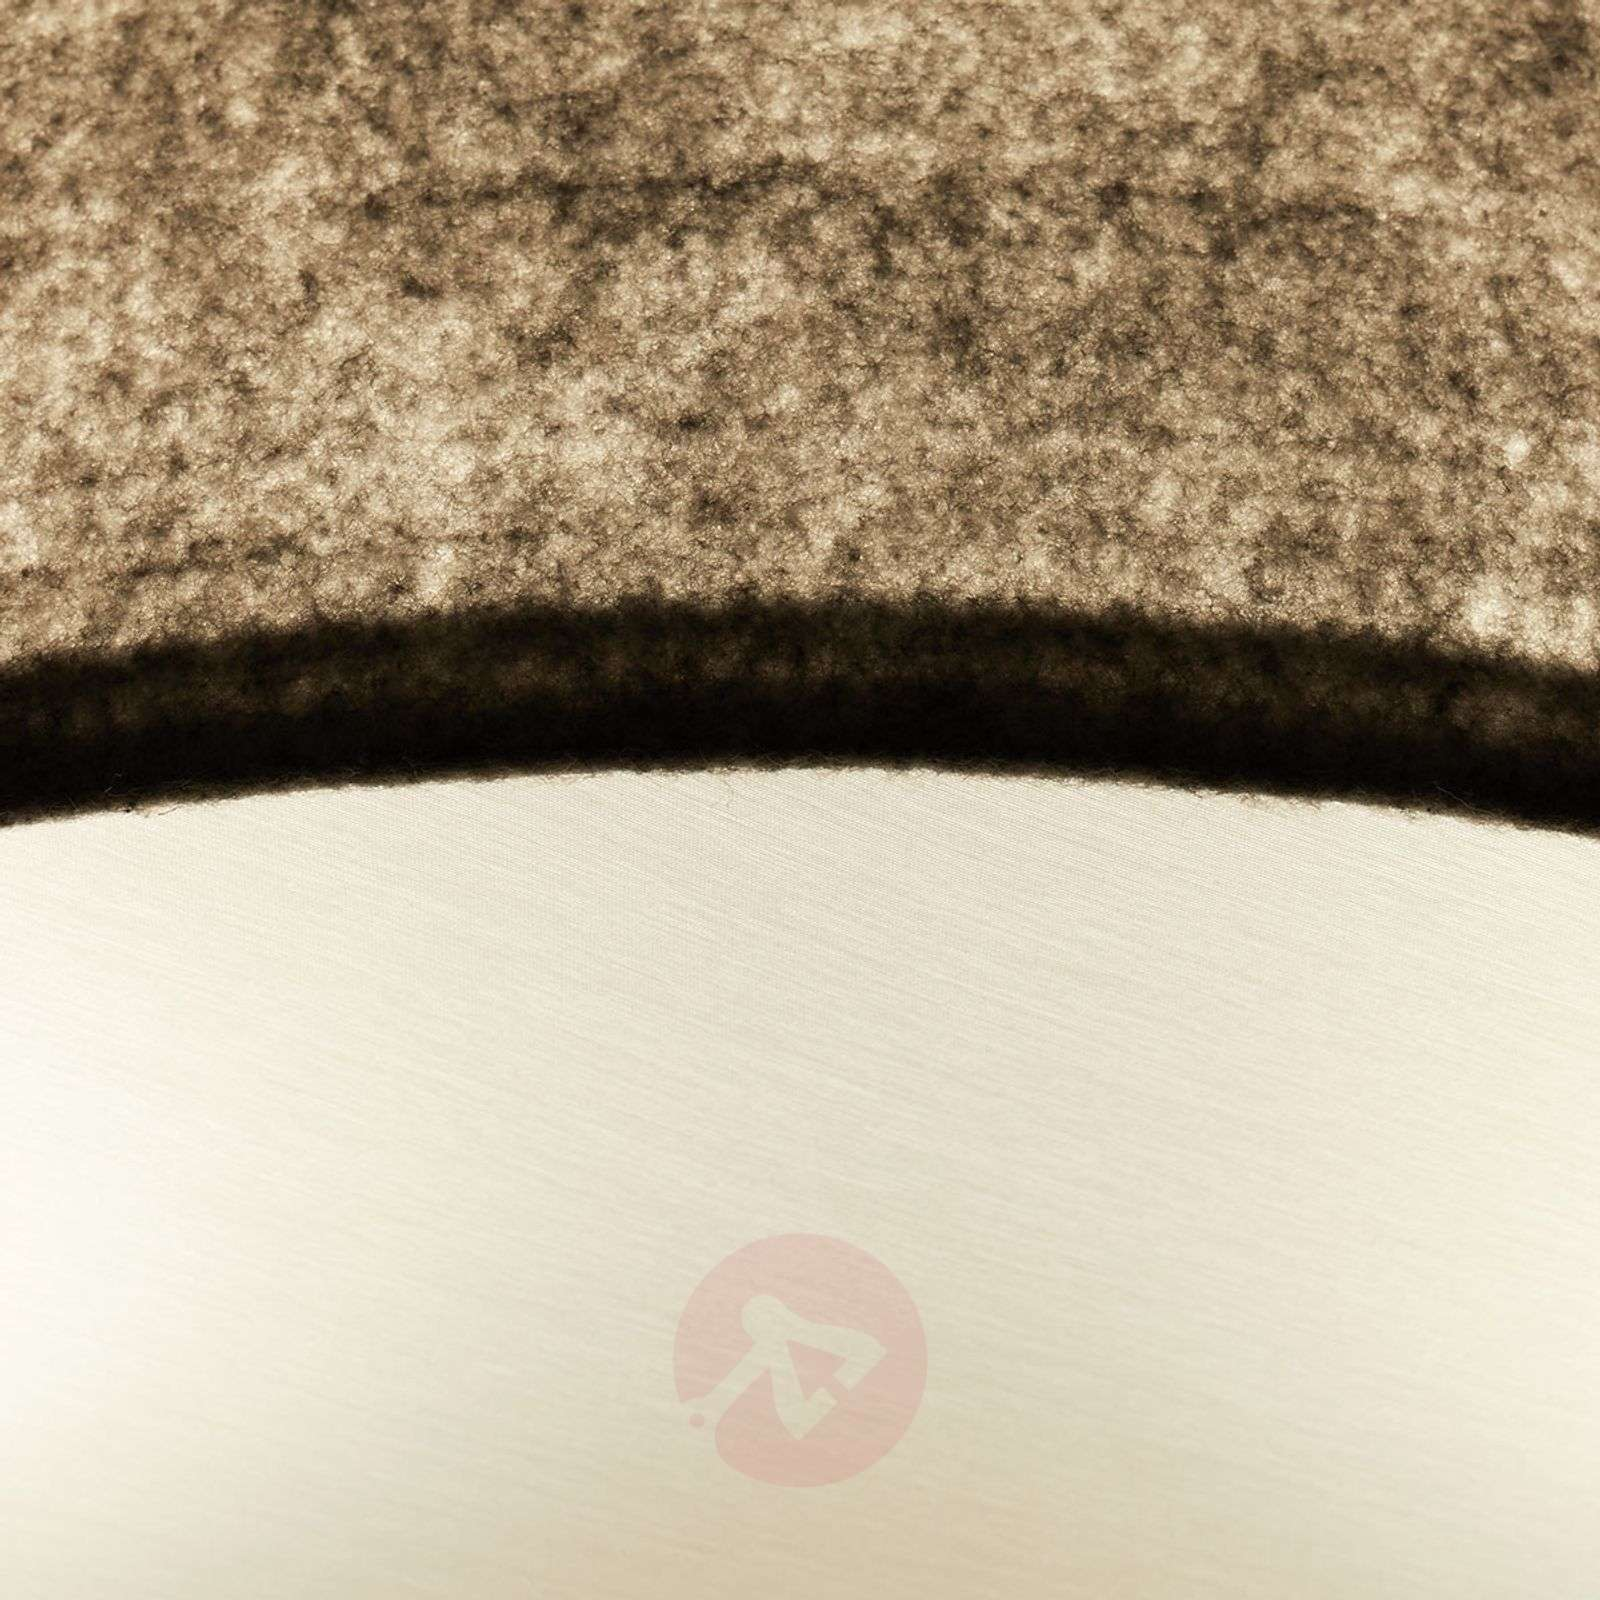 Gala-kattovalo, 50 cm, vaaleanharmaa huopa-6722456-02